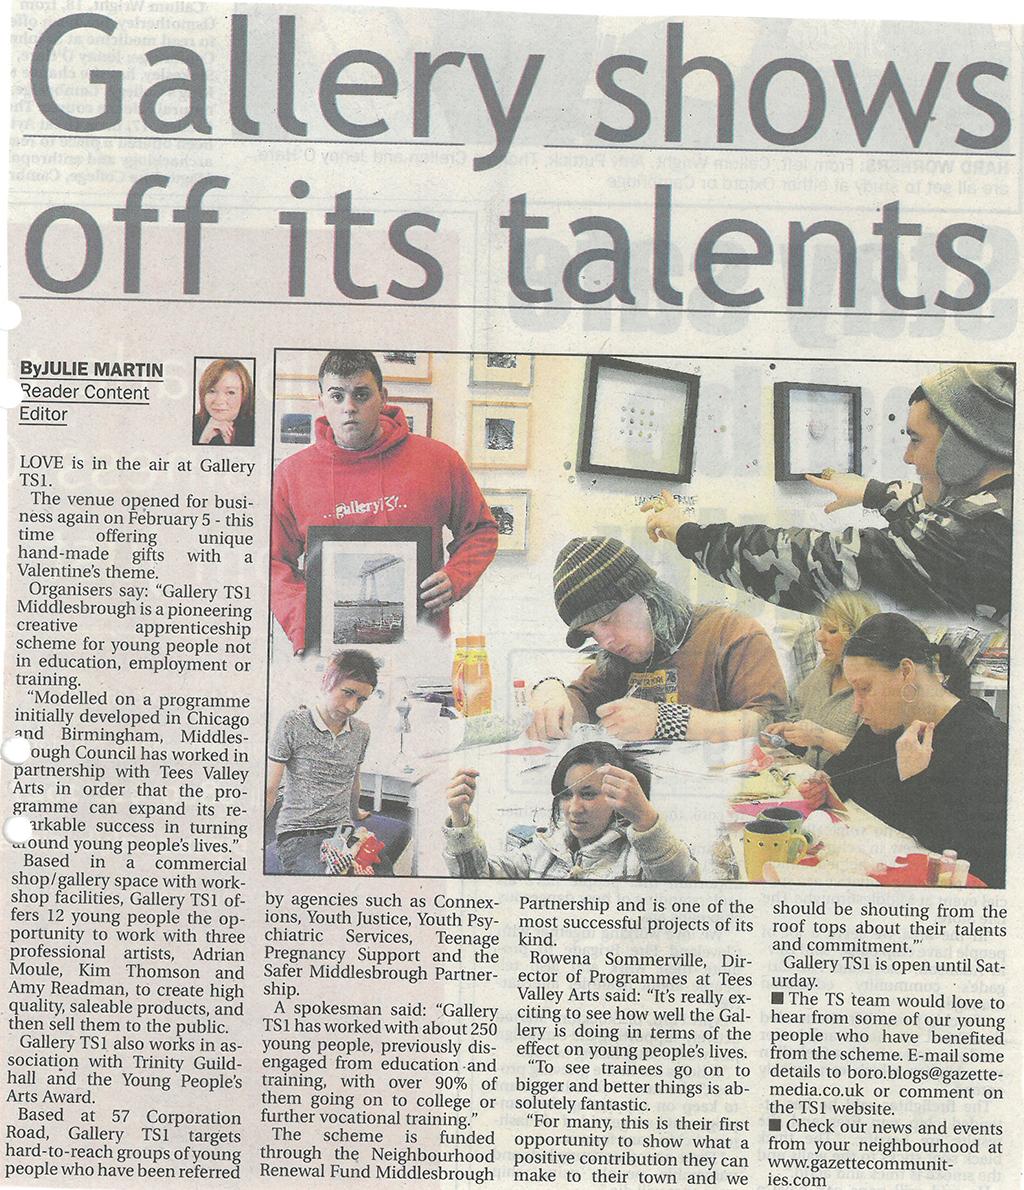 2008-02-12, Evening Gazette